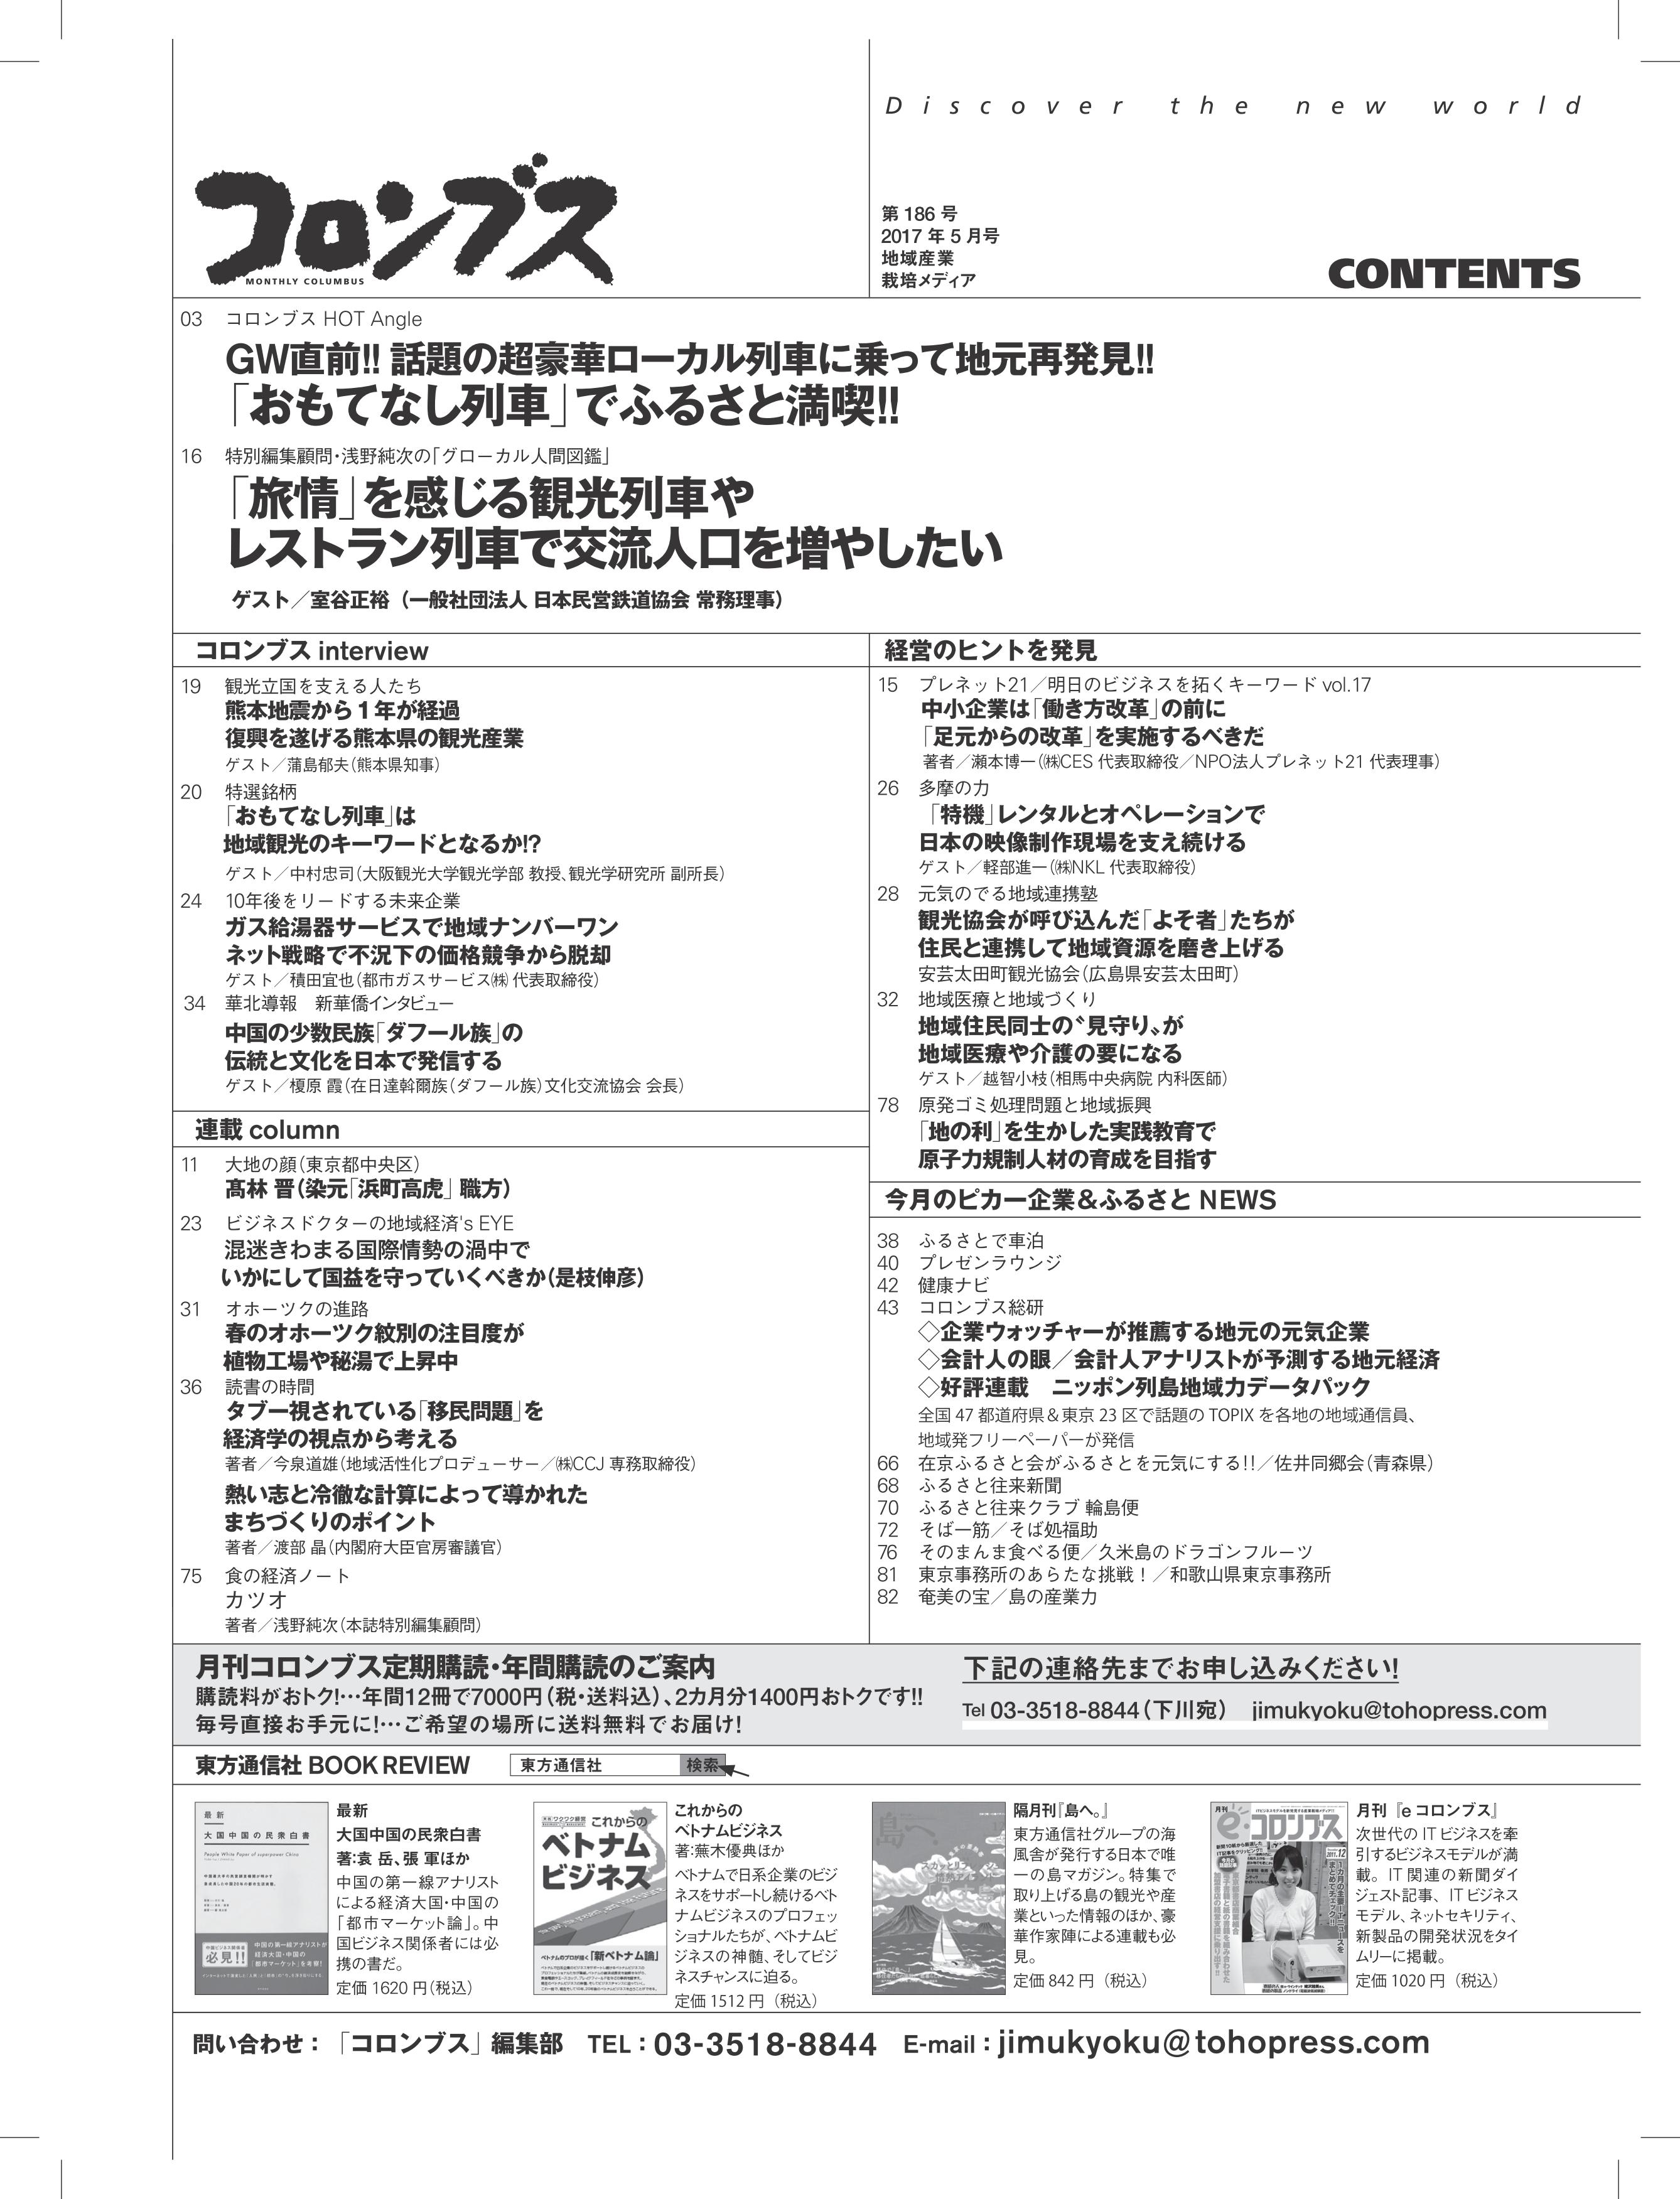 mokuji201705